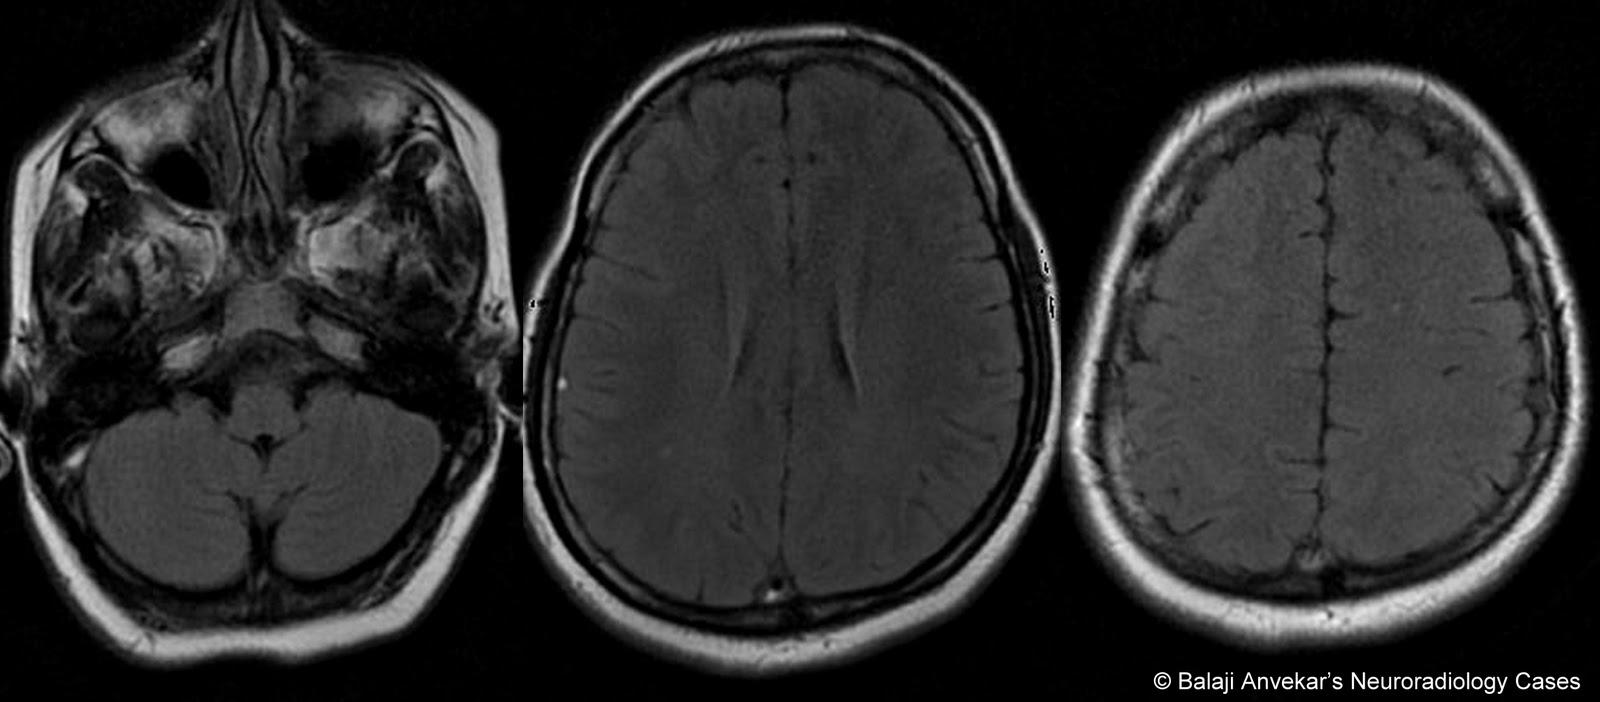 Dr Balaji Anvekar U0026 39 S Neuroradiology Cases  Dural Sinus